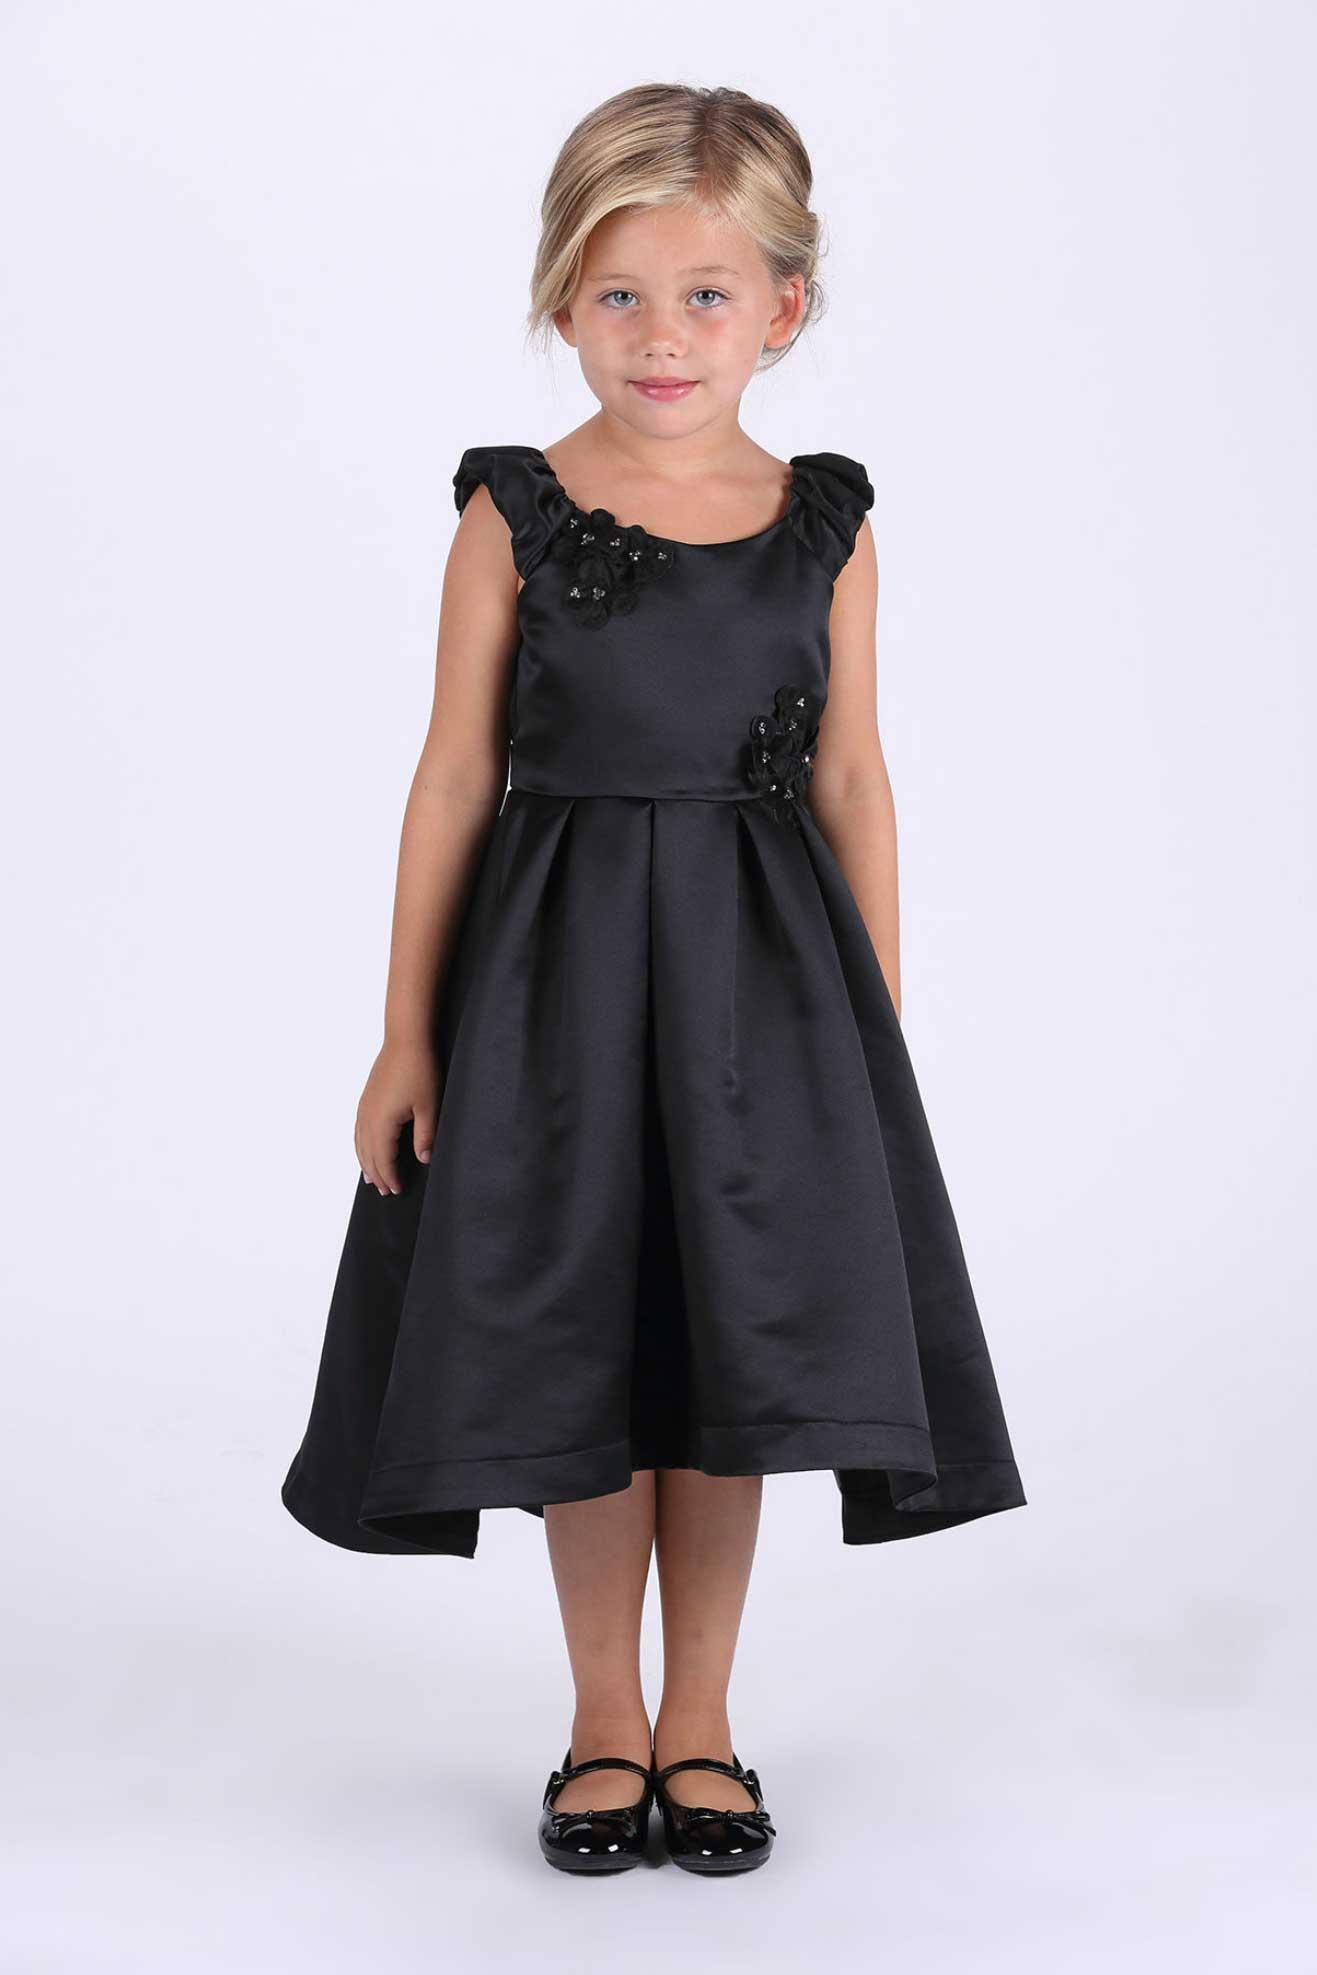 Ic 9471b Girls Dress Style 9471 Isobella And Chloe Cap